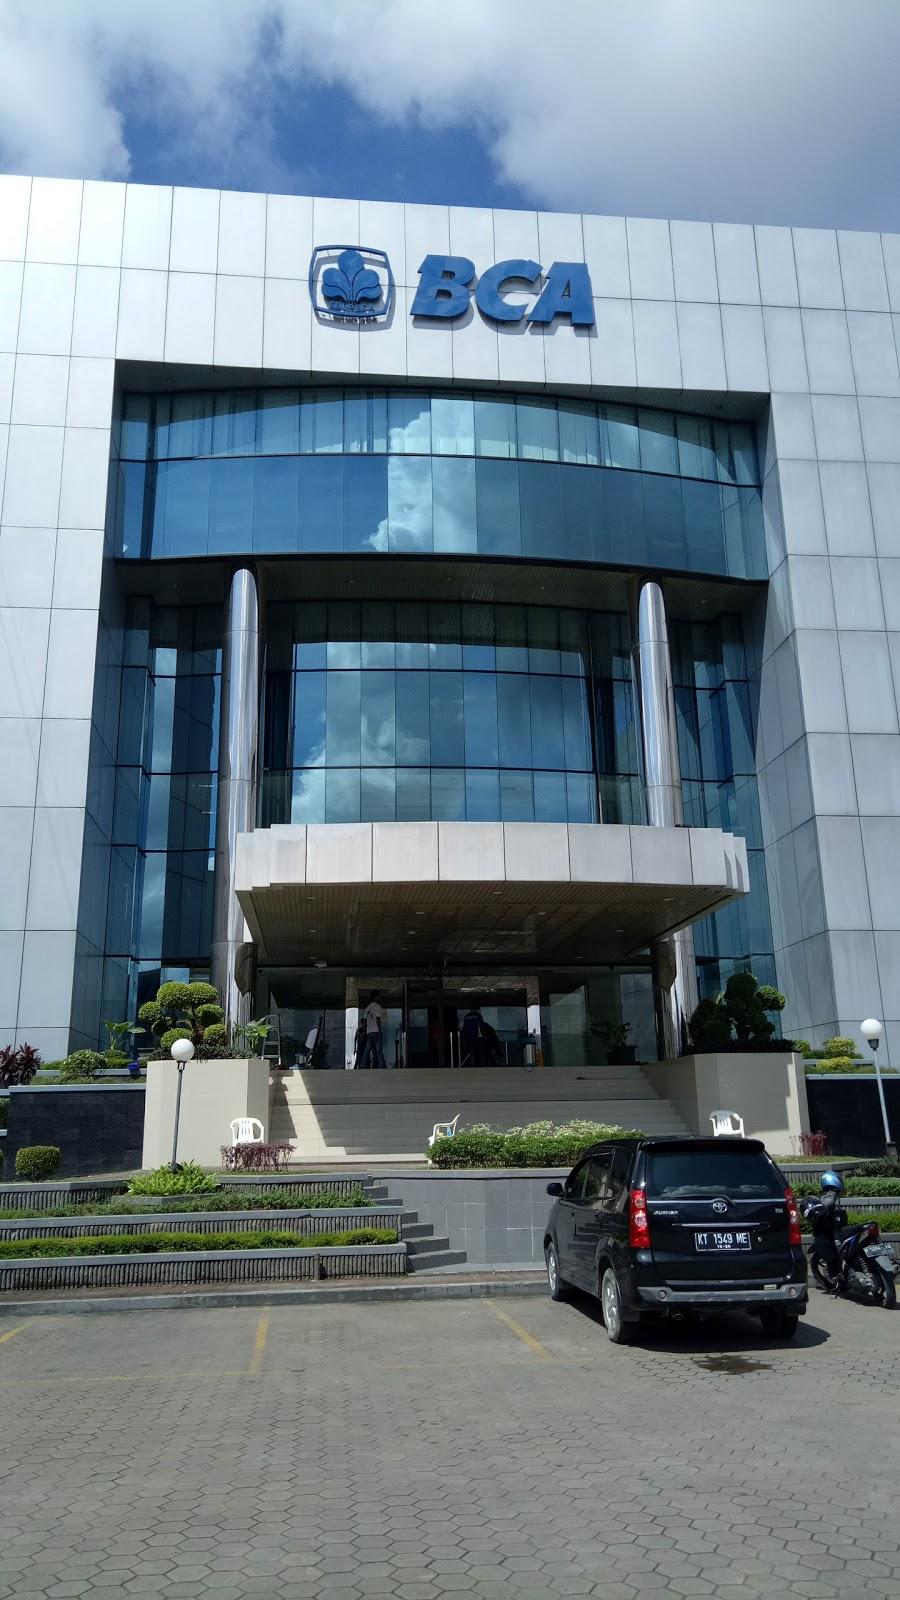 Bank Central Asia Bca Kcu Samarinda 62 541 738900 Jl Jenderal Sudirman No 30 Bugis Ps Pagi Samarinda Kota Kota Samarinda Kalimantan Timur 75242 Indonesia